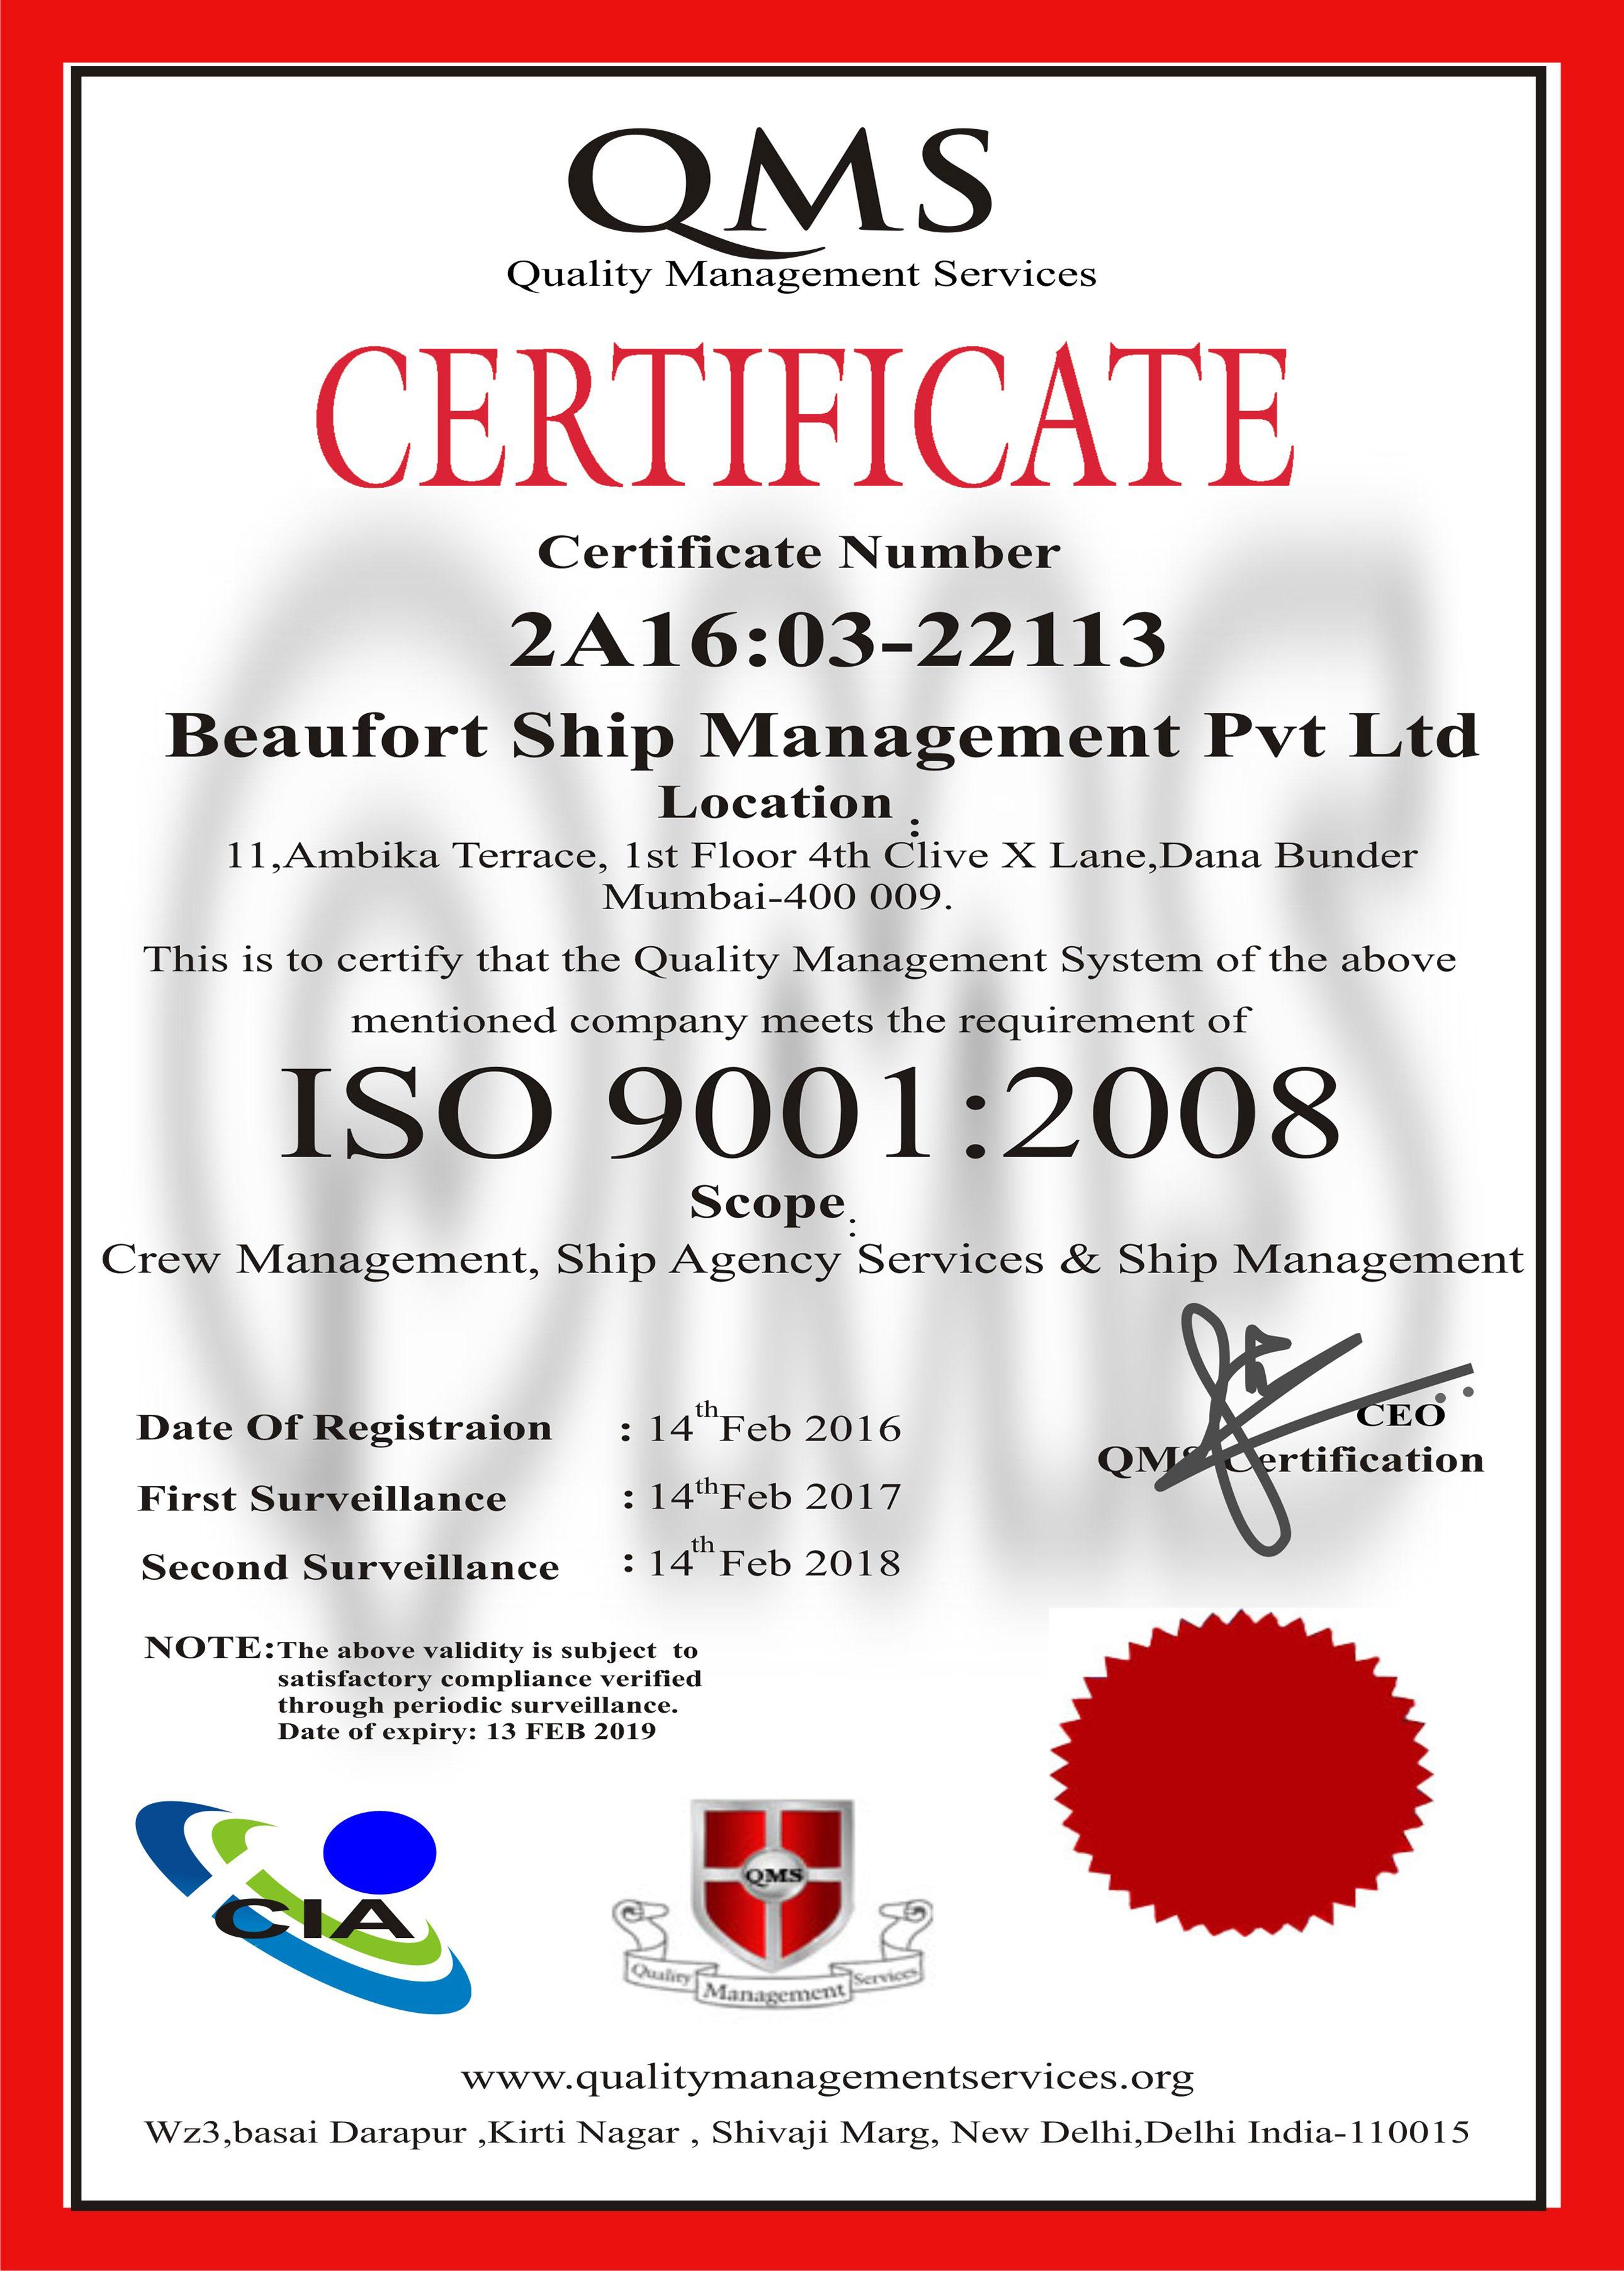 Beaufort Ship Management Pvt Ltd